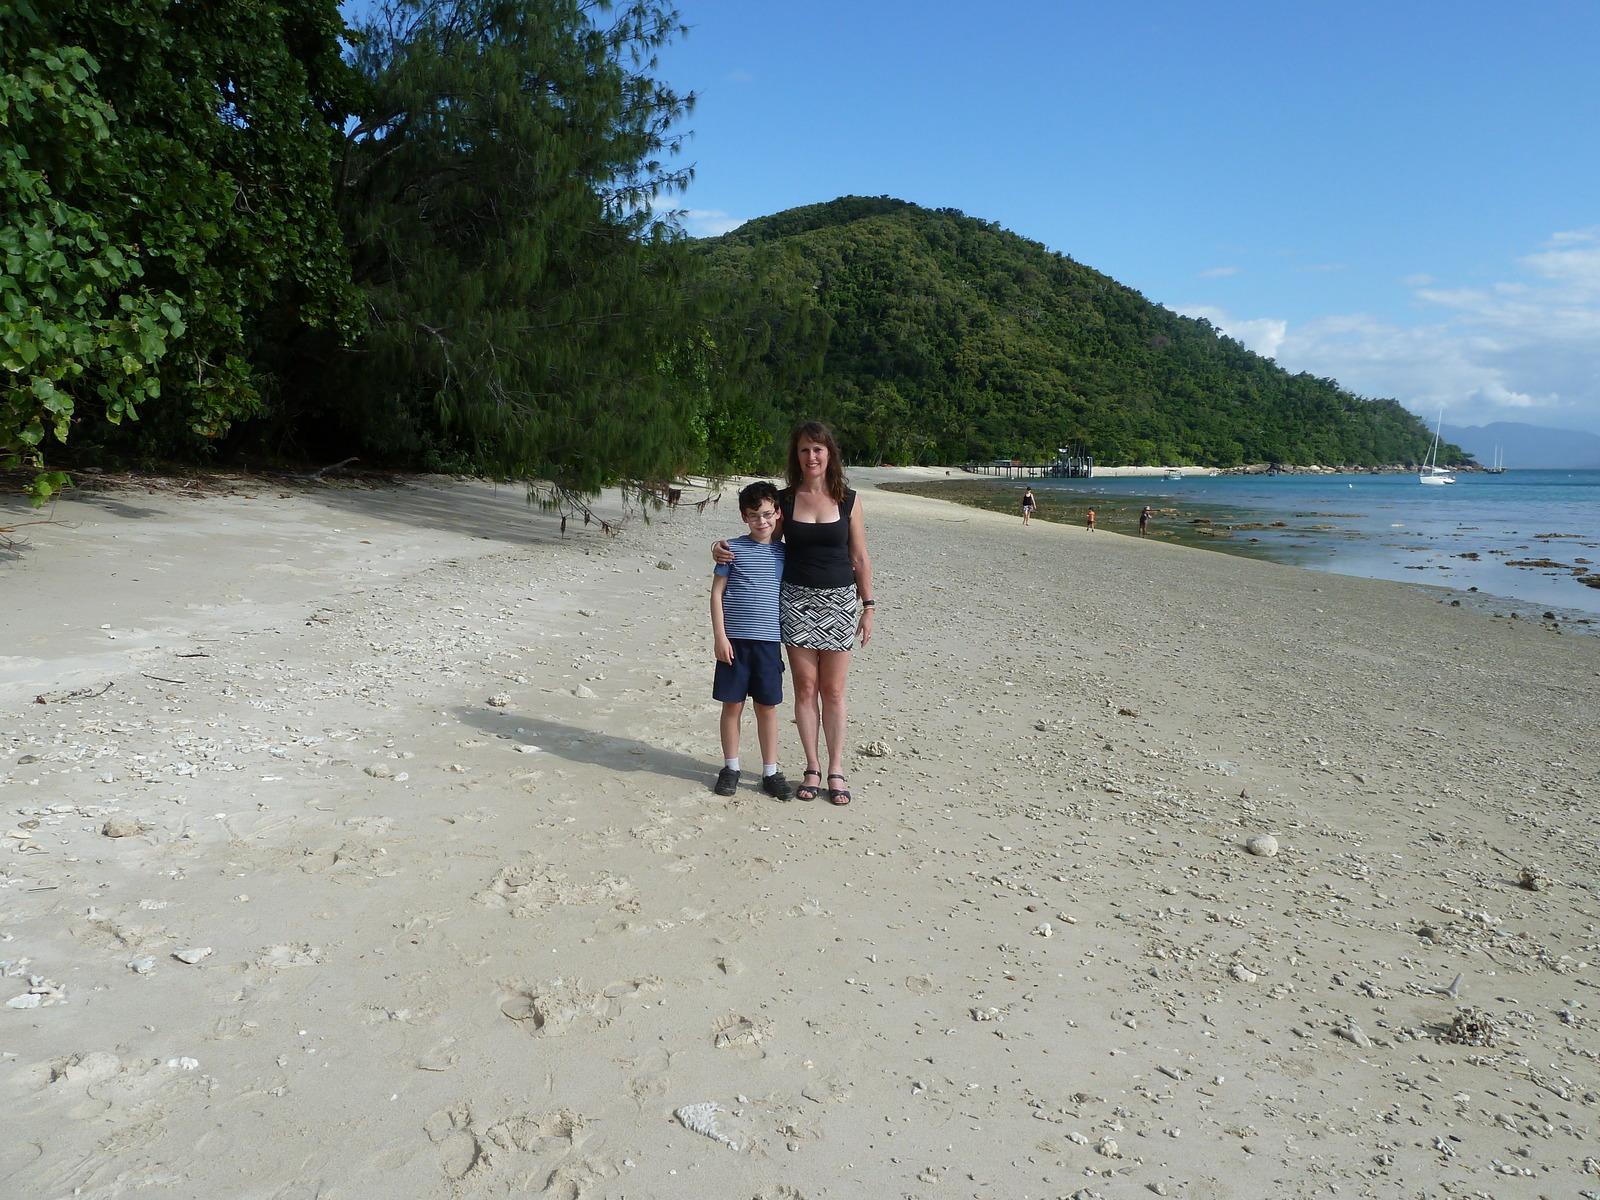 Beachside at Fitzroy Island